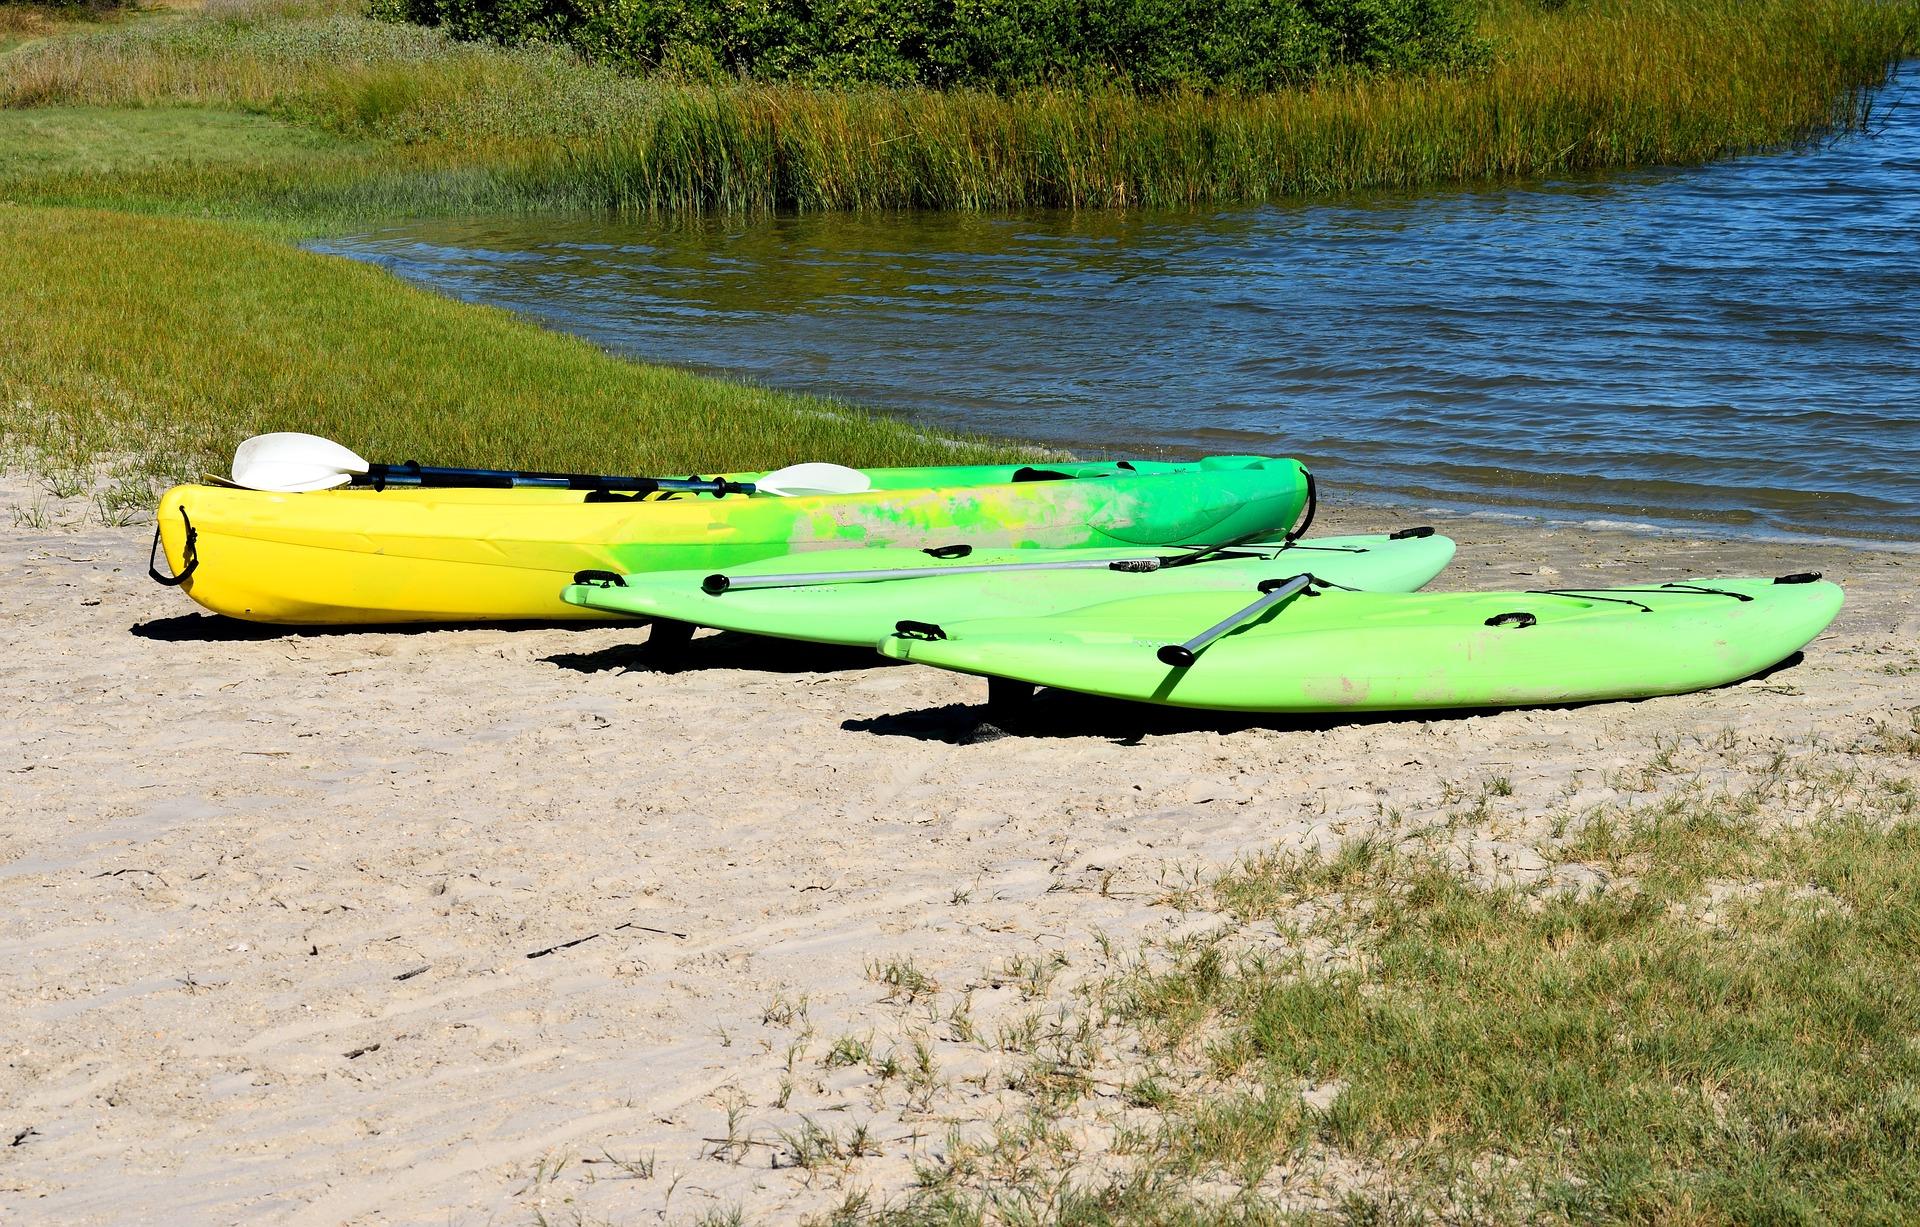 Kano en boten weghalen bij Wolderwijd in Harderwijk zeepad